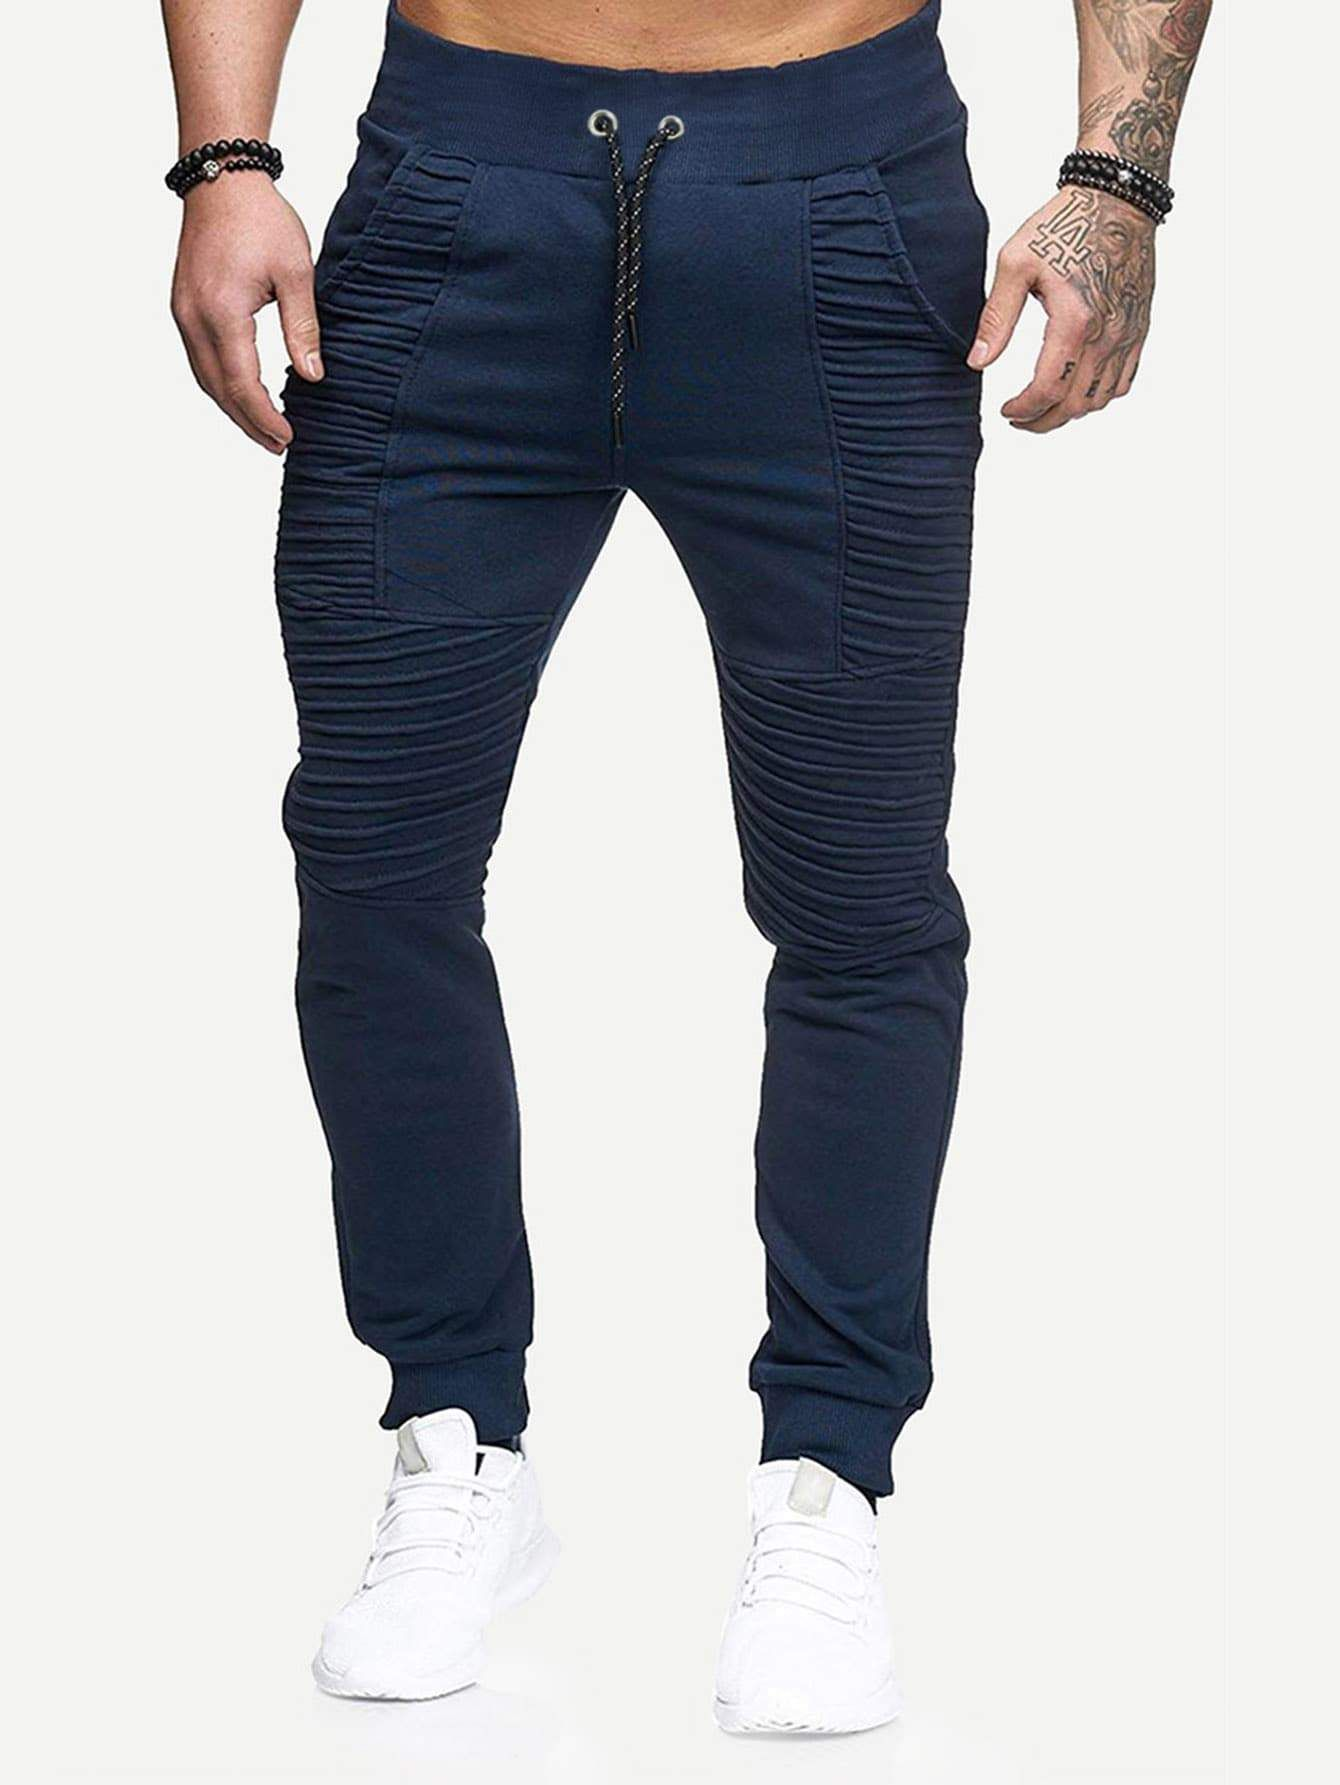 Mens Plain Camo Fleece Joggers Bottoms Jogging Pants Gym Fitness Sports Casual